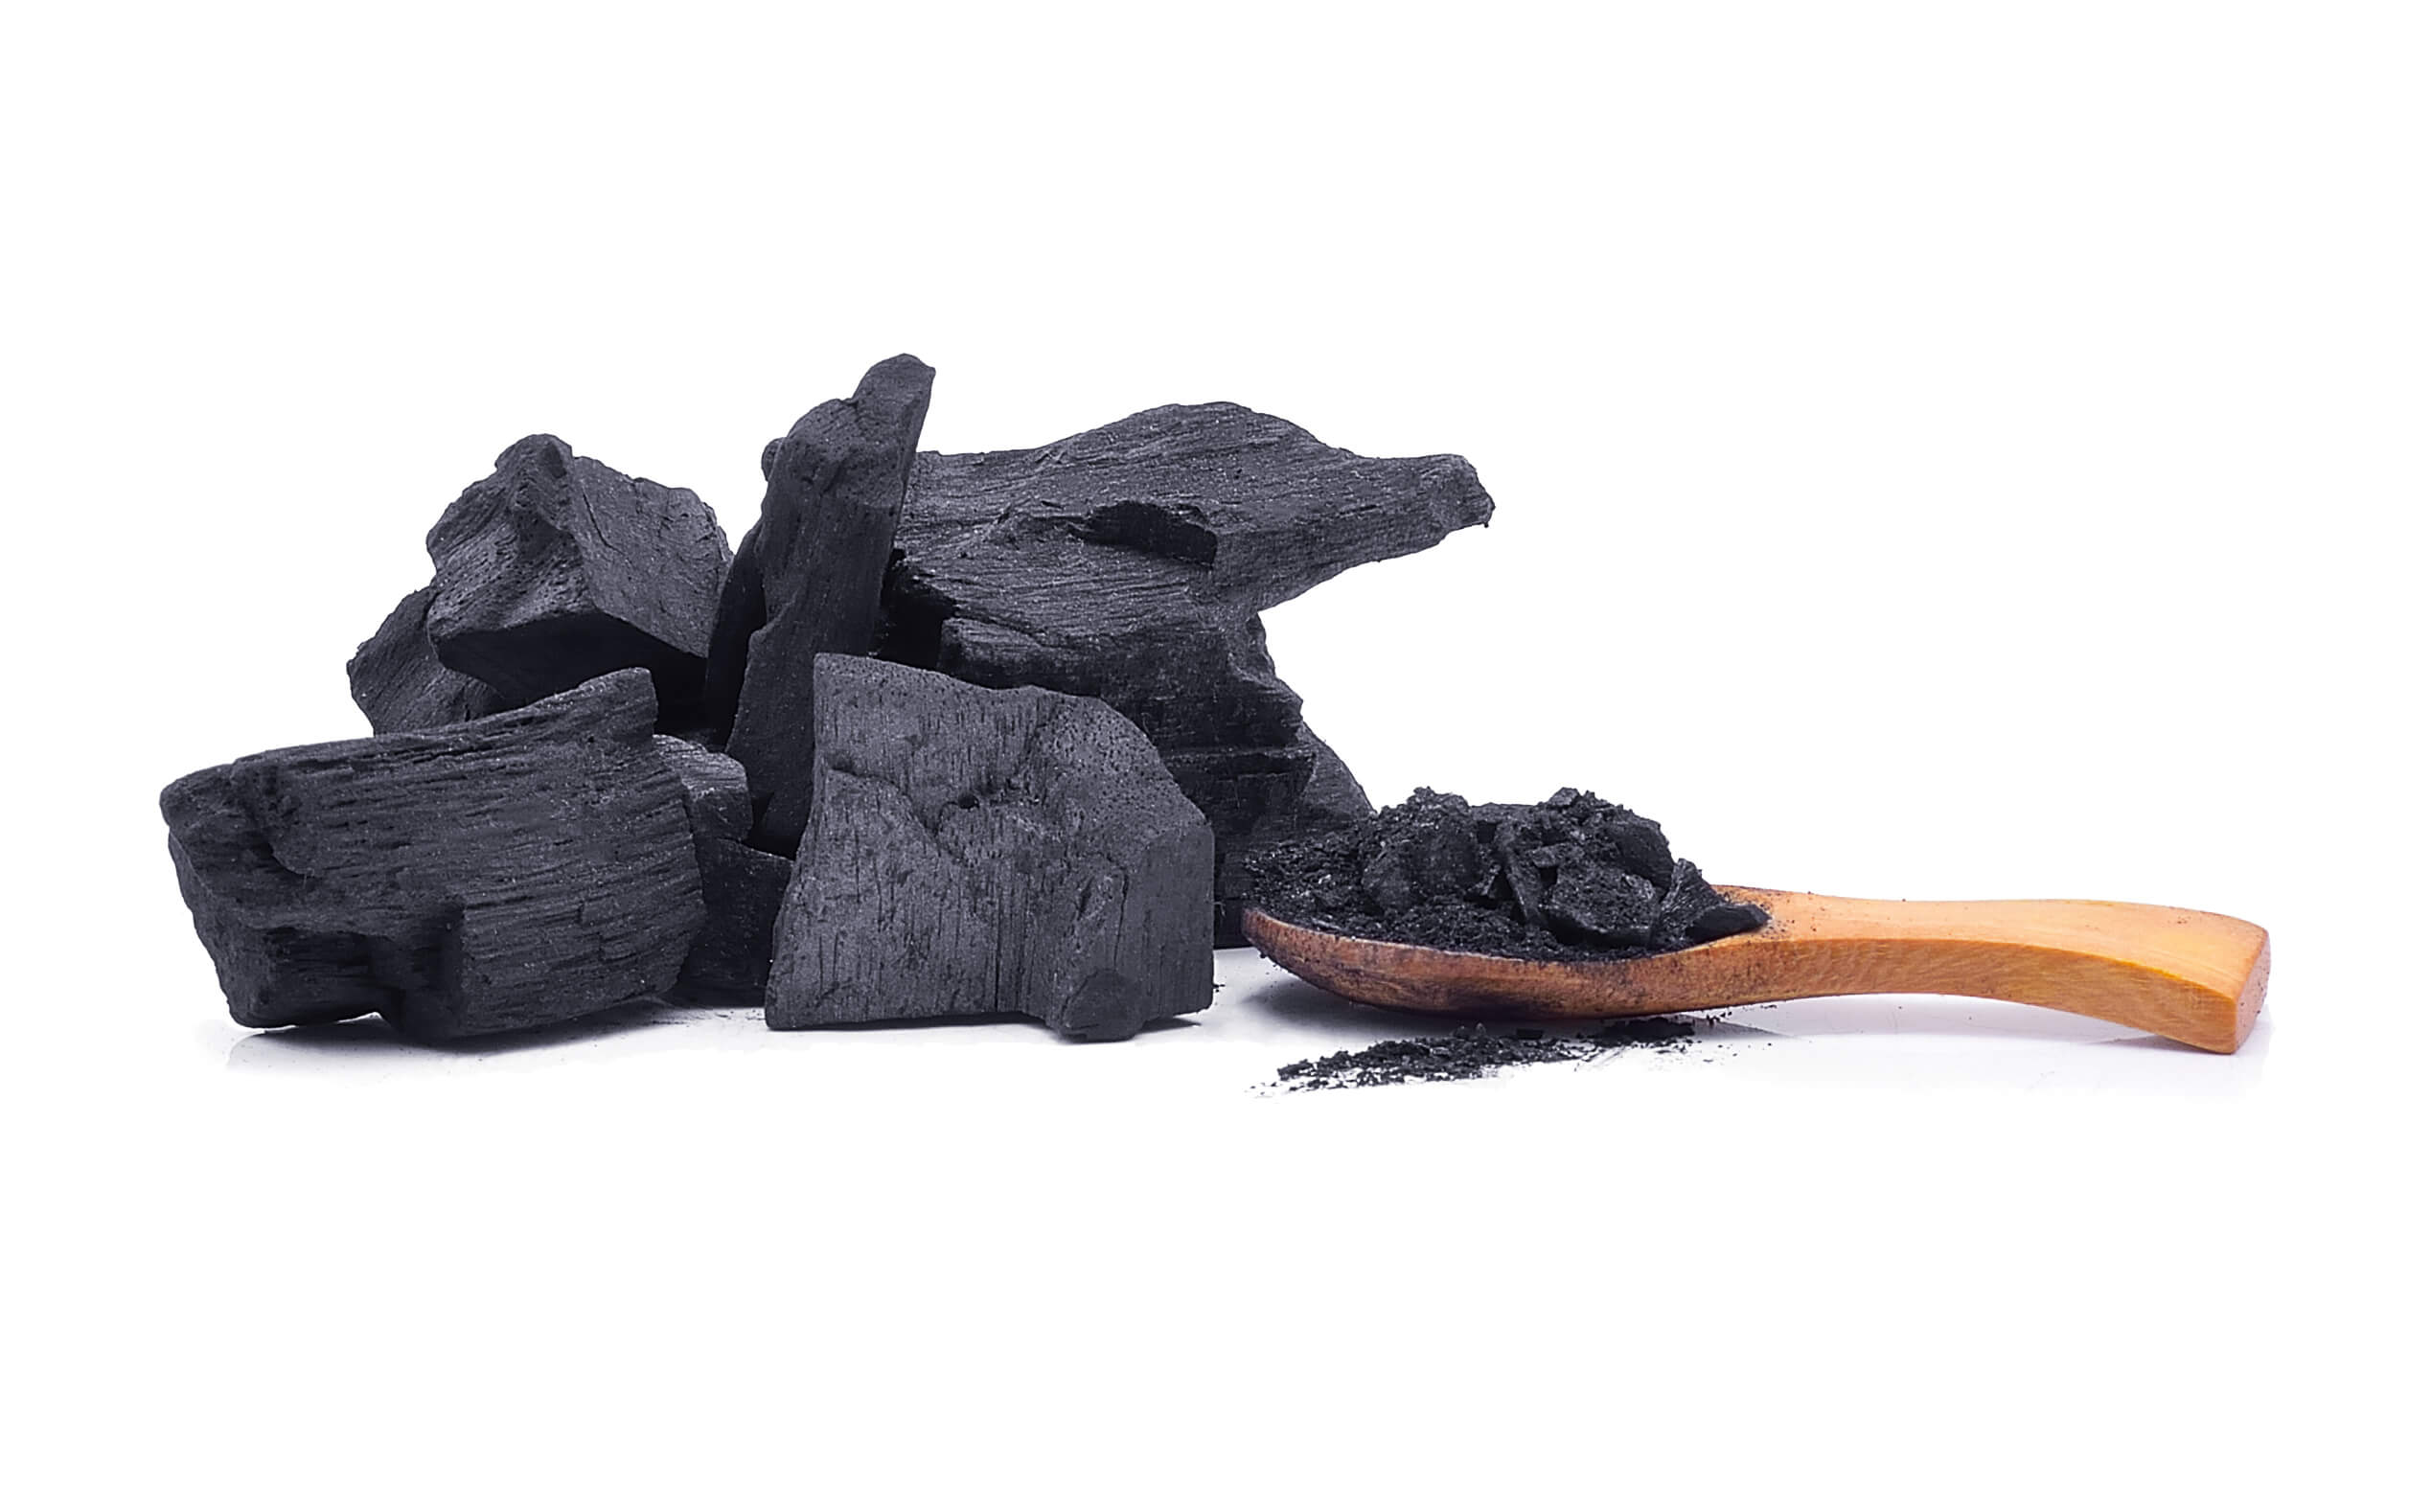 Le charbon végétal bio, kézako ?